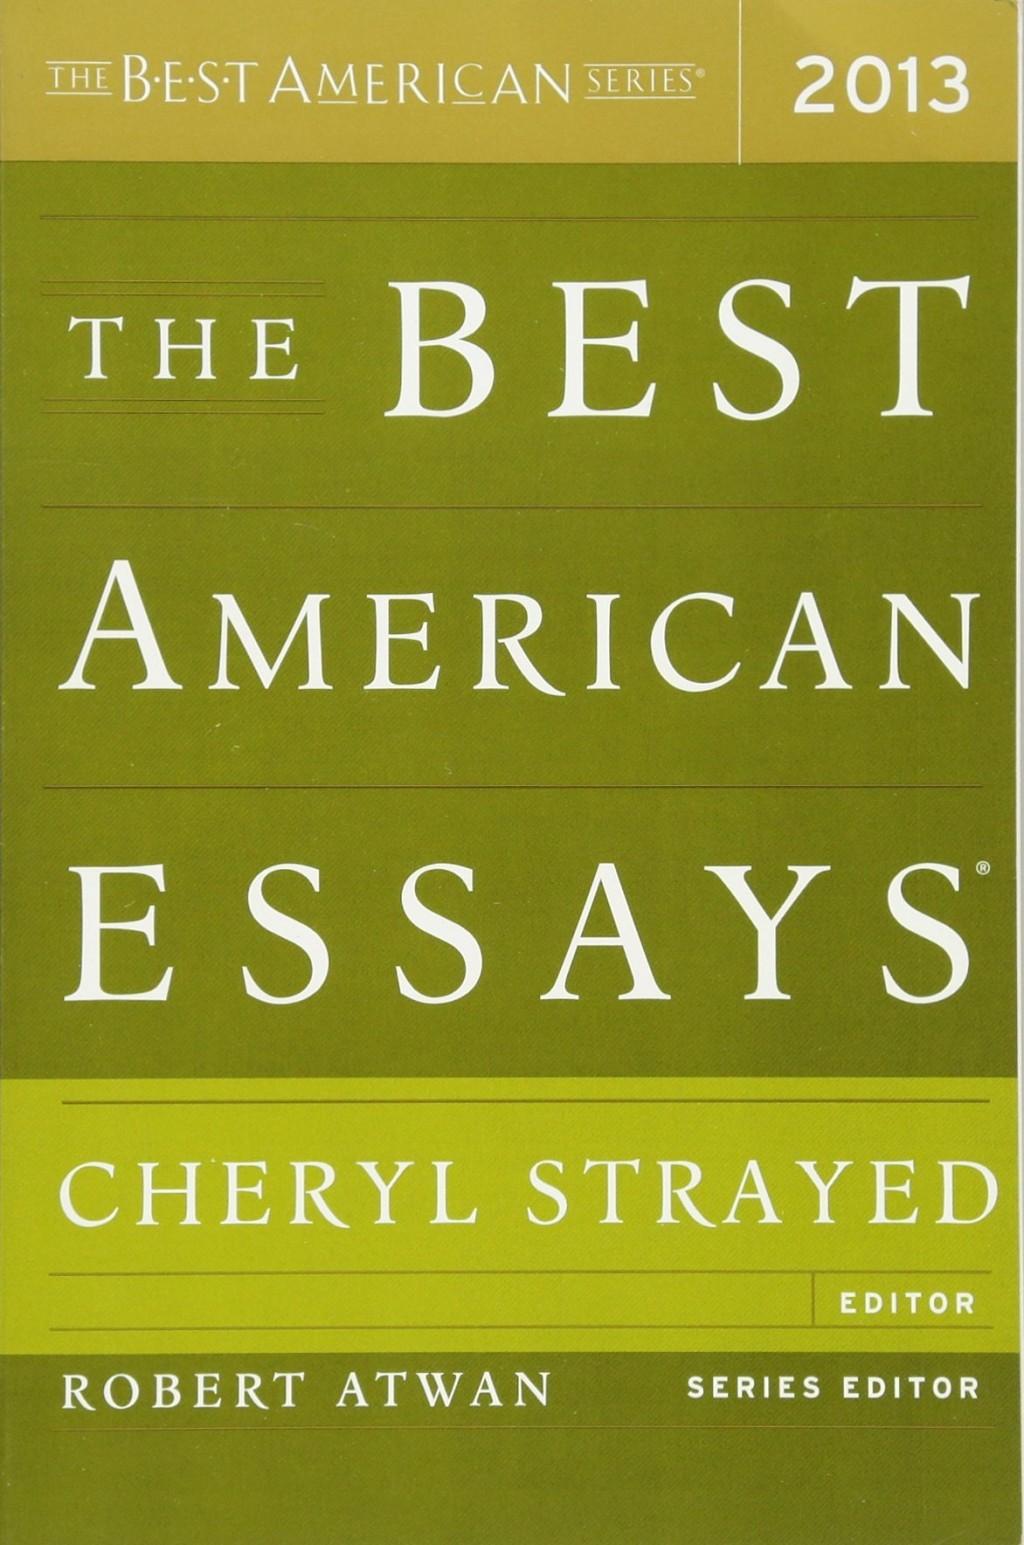 003 The Best American Essays 81nkls2j9vl Essay Wonderful 2013 Pdf Download Of Century Sparknotes 2017 Large